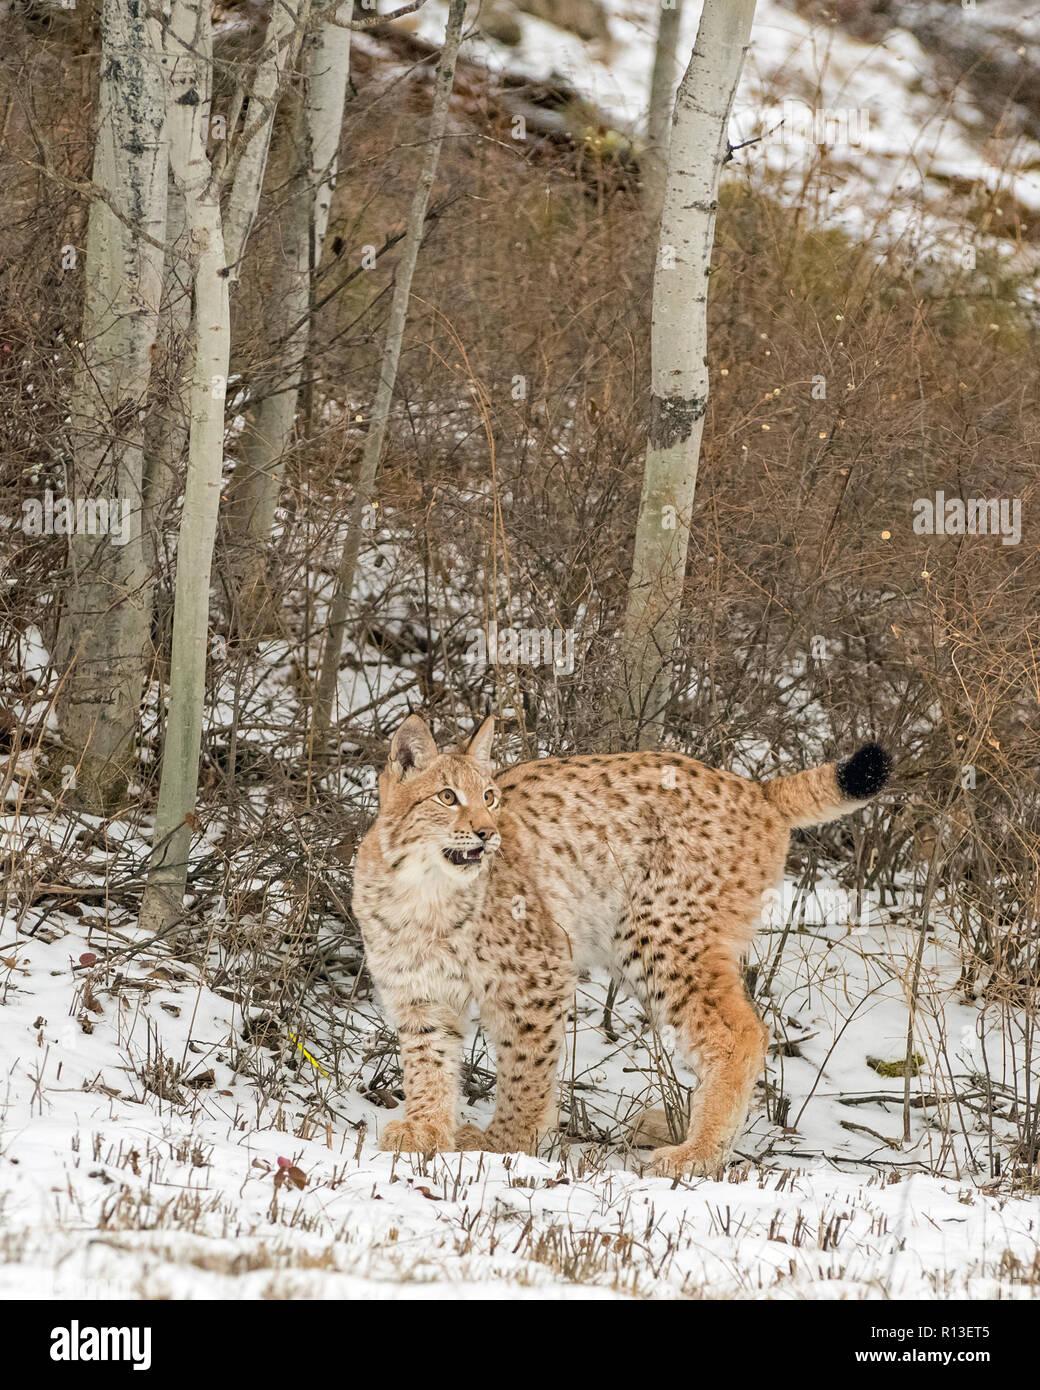 Siberian Lynx Cub Kitten in the Snow 4 - Stock Image